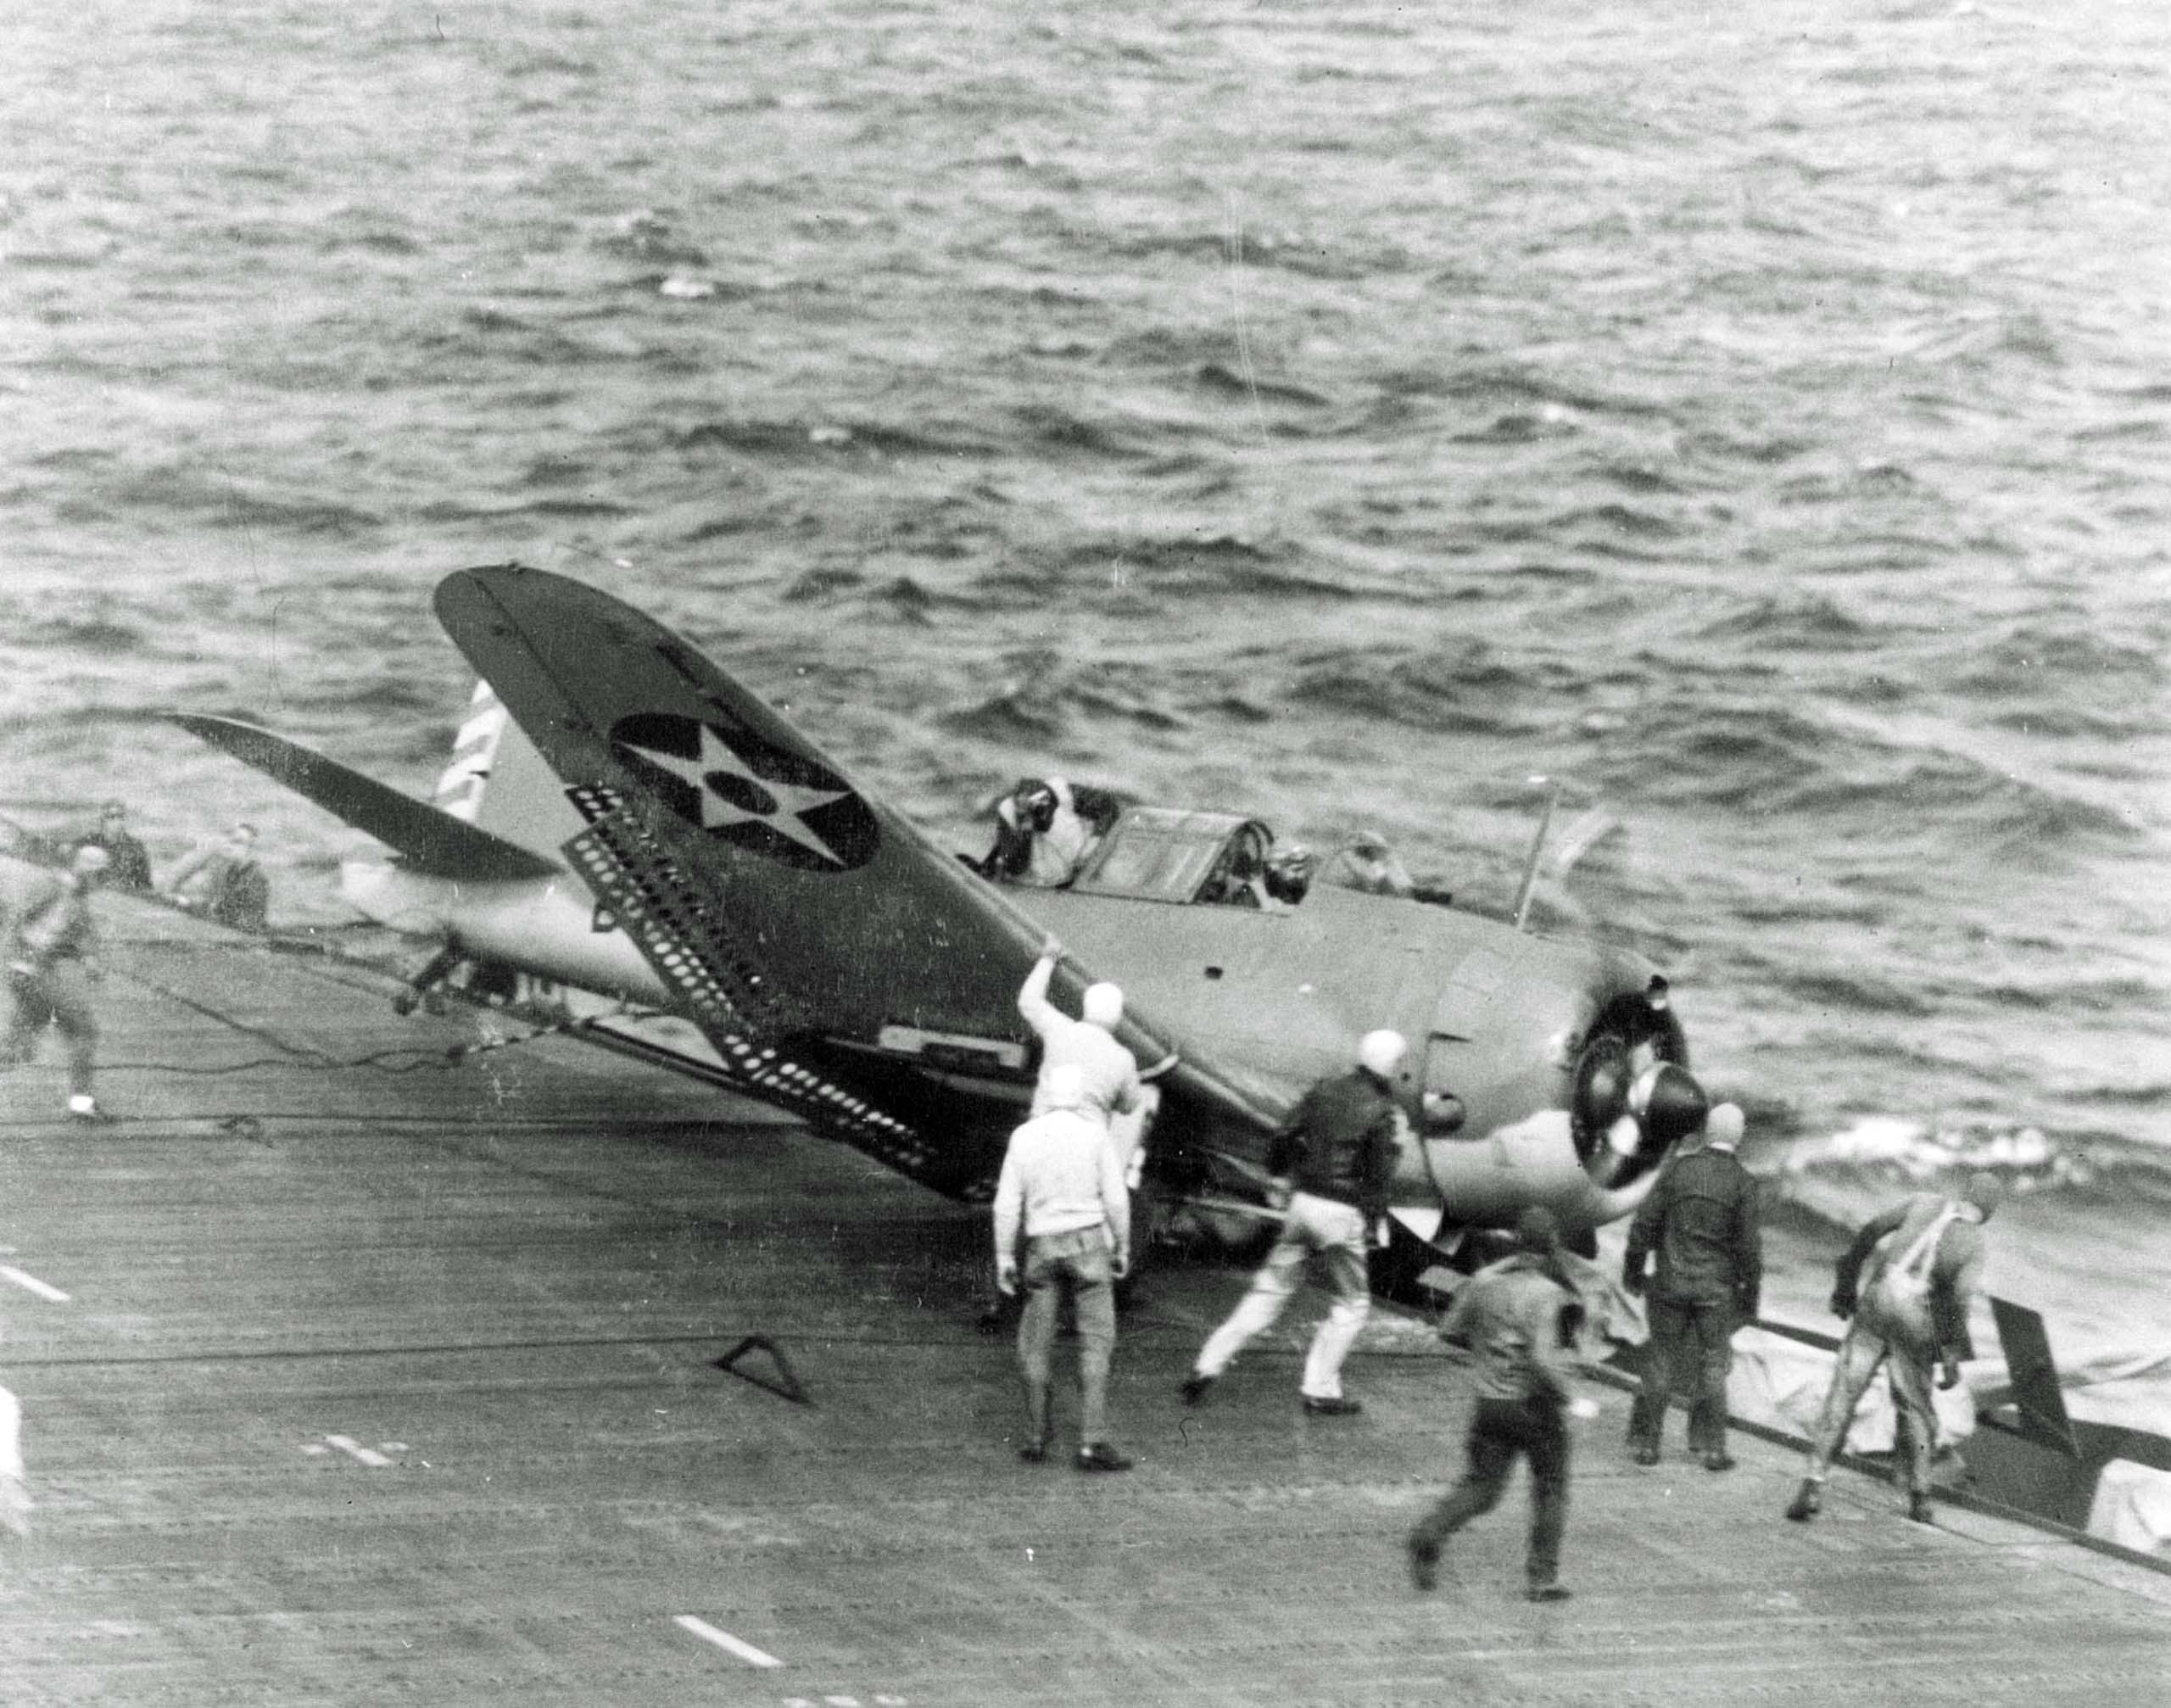 SBD dive bomber